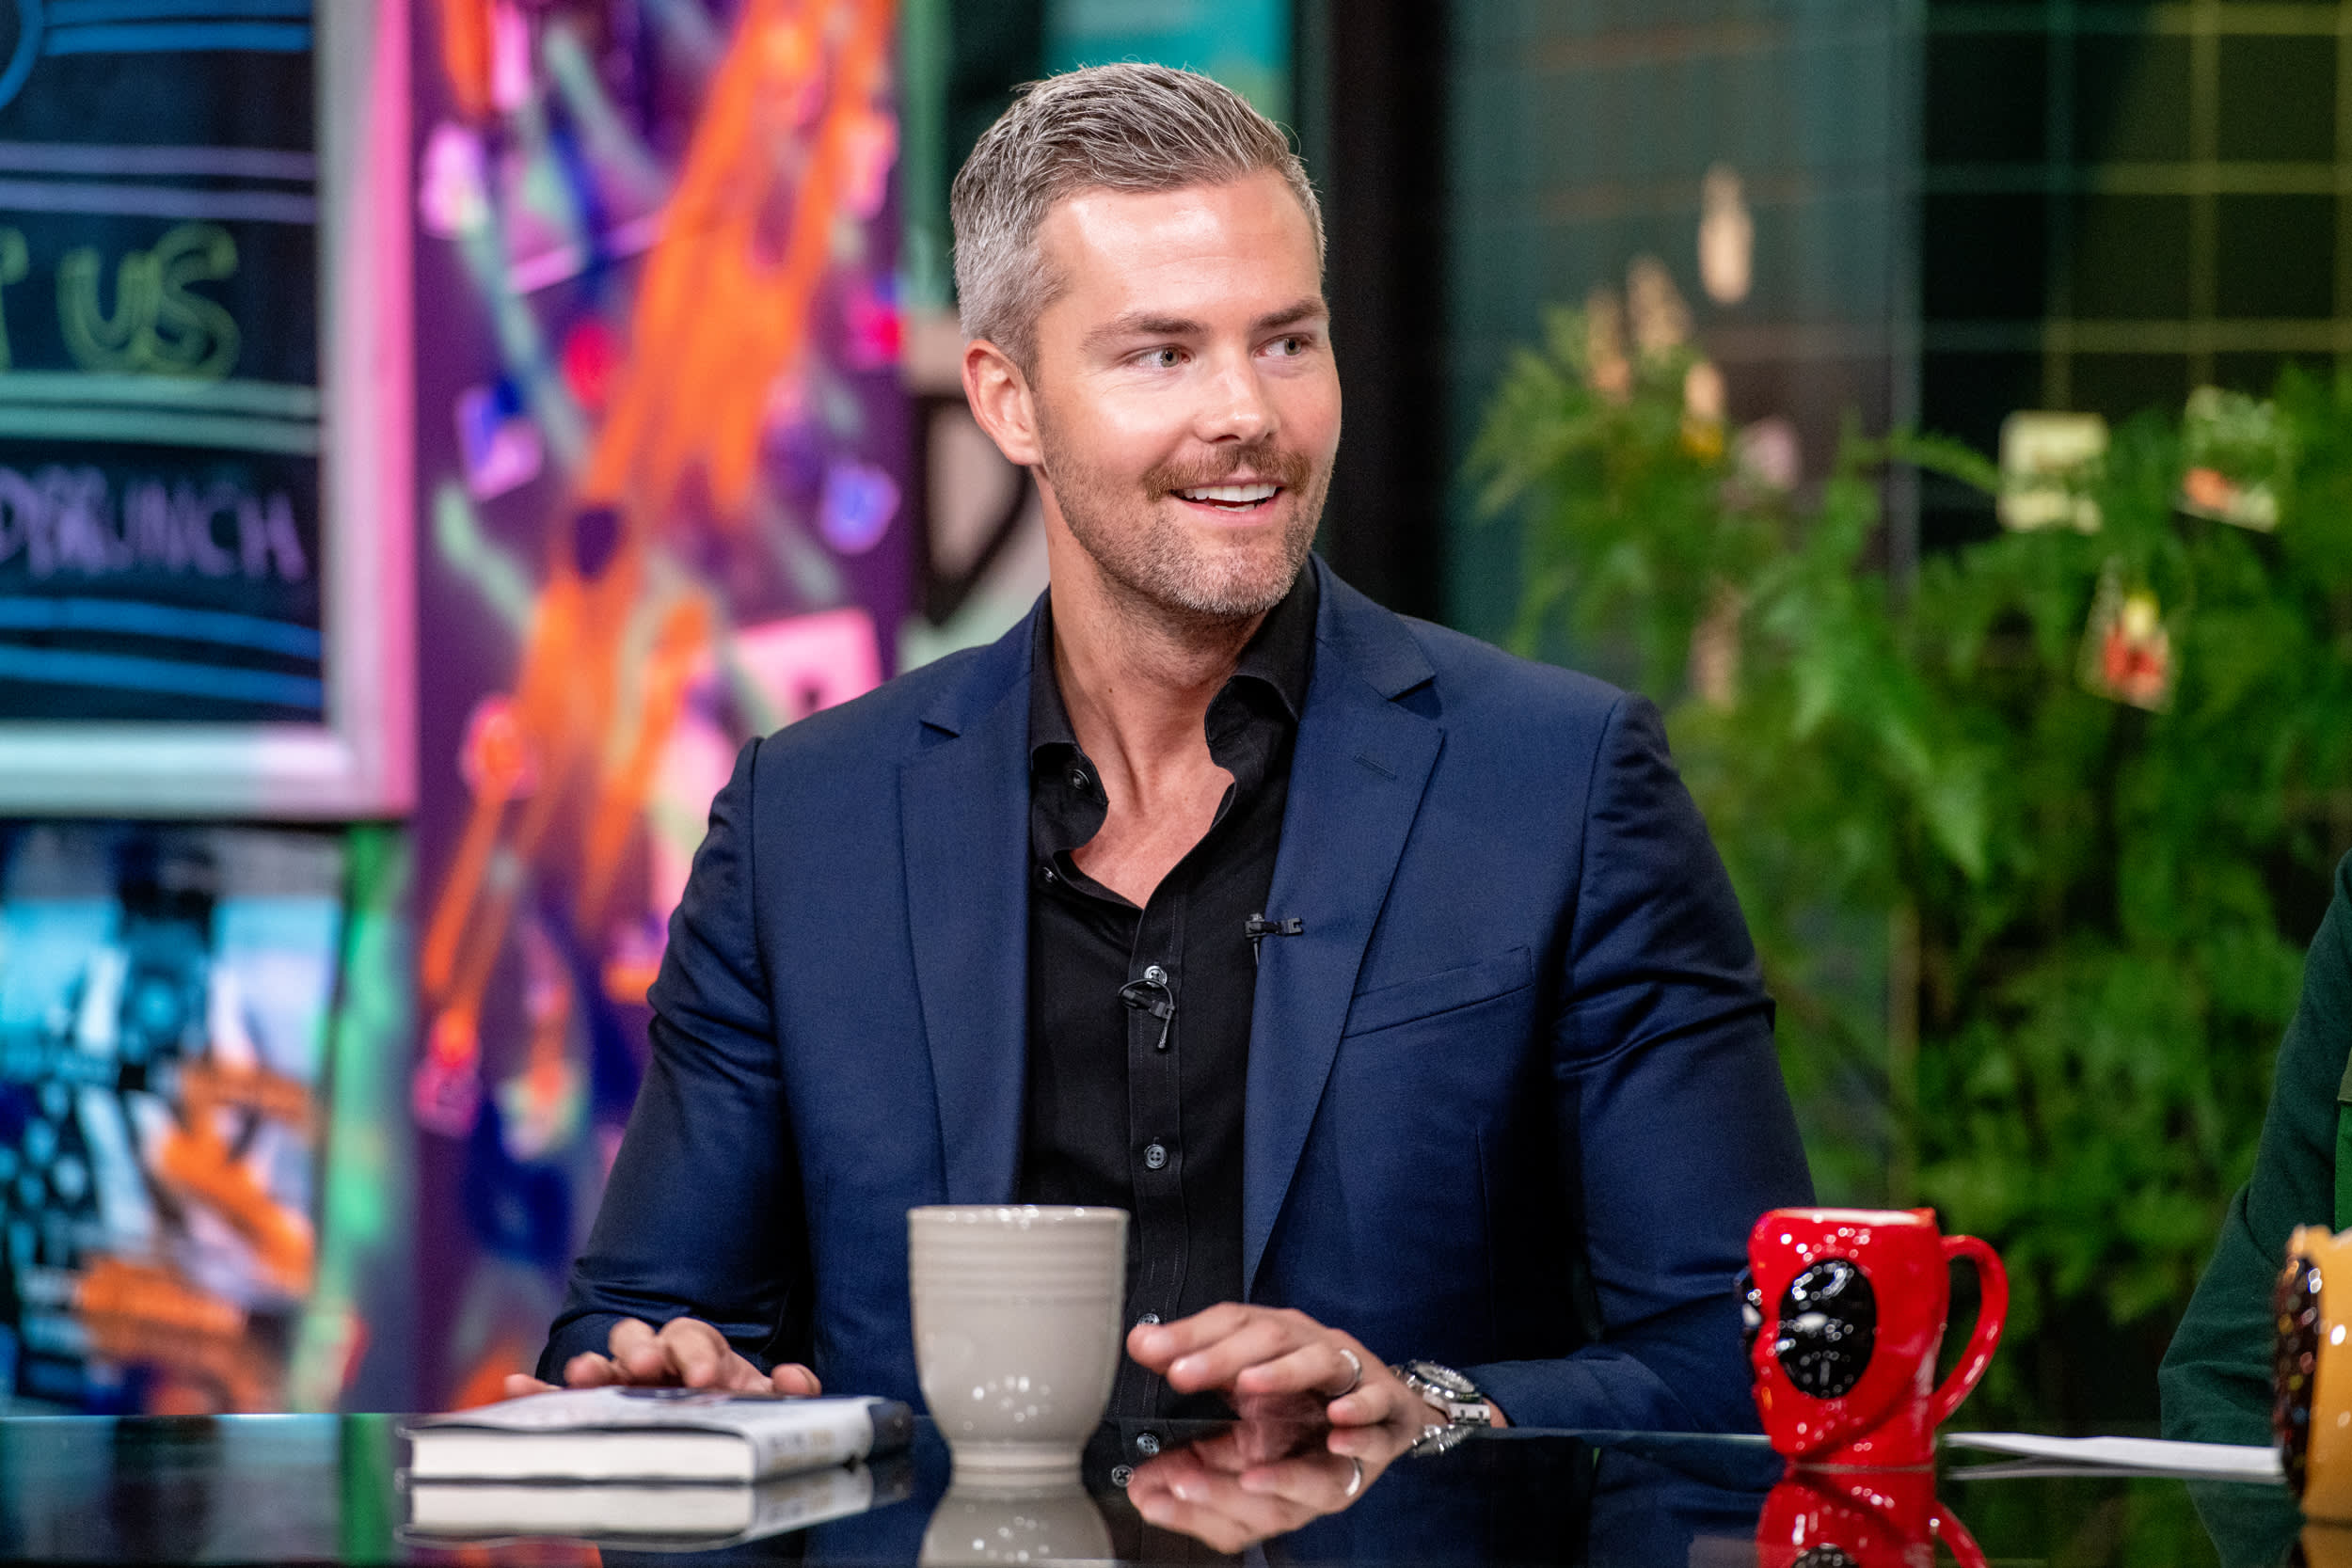 'Million Dollar Listing' star Ryan Serhant: How I learned about money